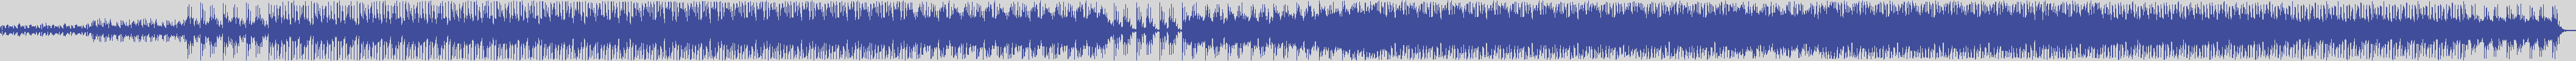 just_digital_records [smile1140] Southern Renx - Mind Konzept [Original Mix] audio wave form